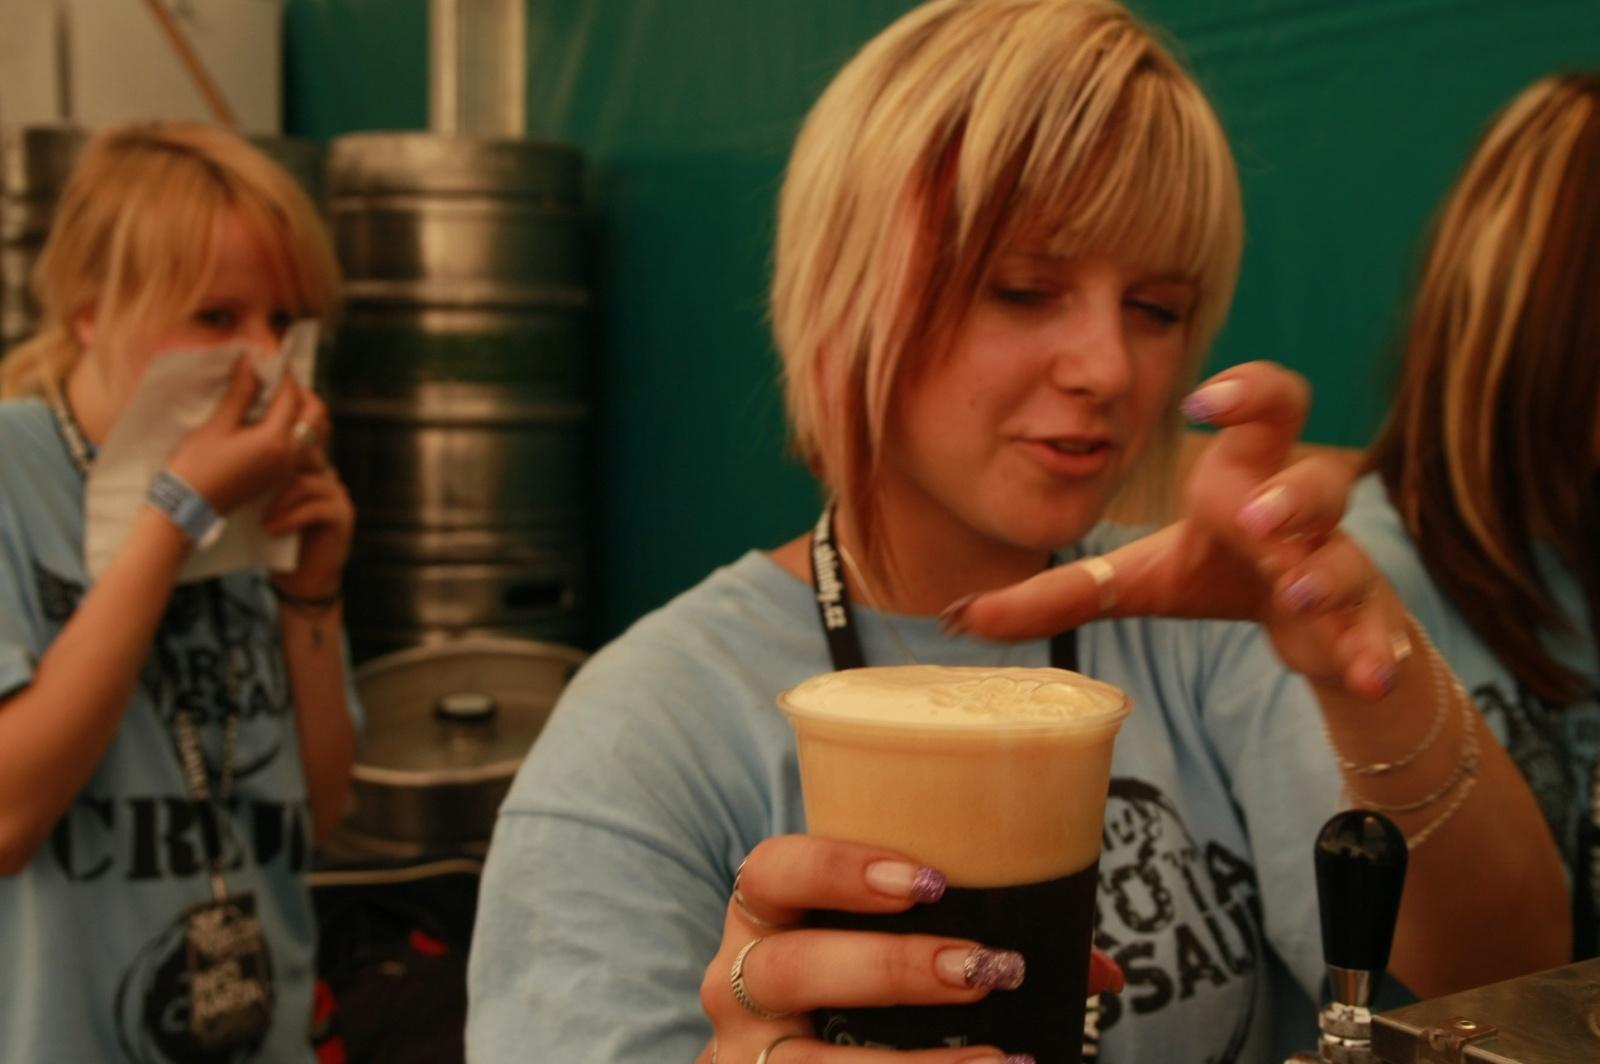 Edno pivo, prosím!